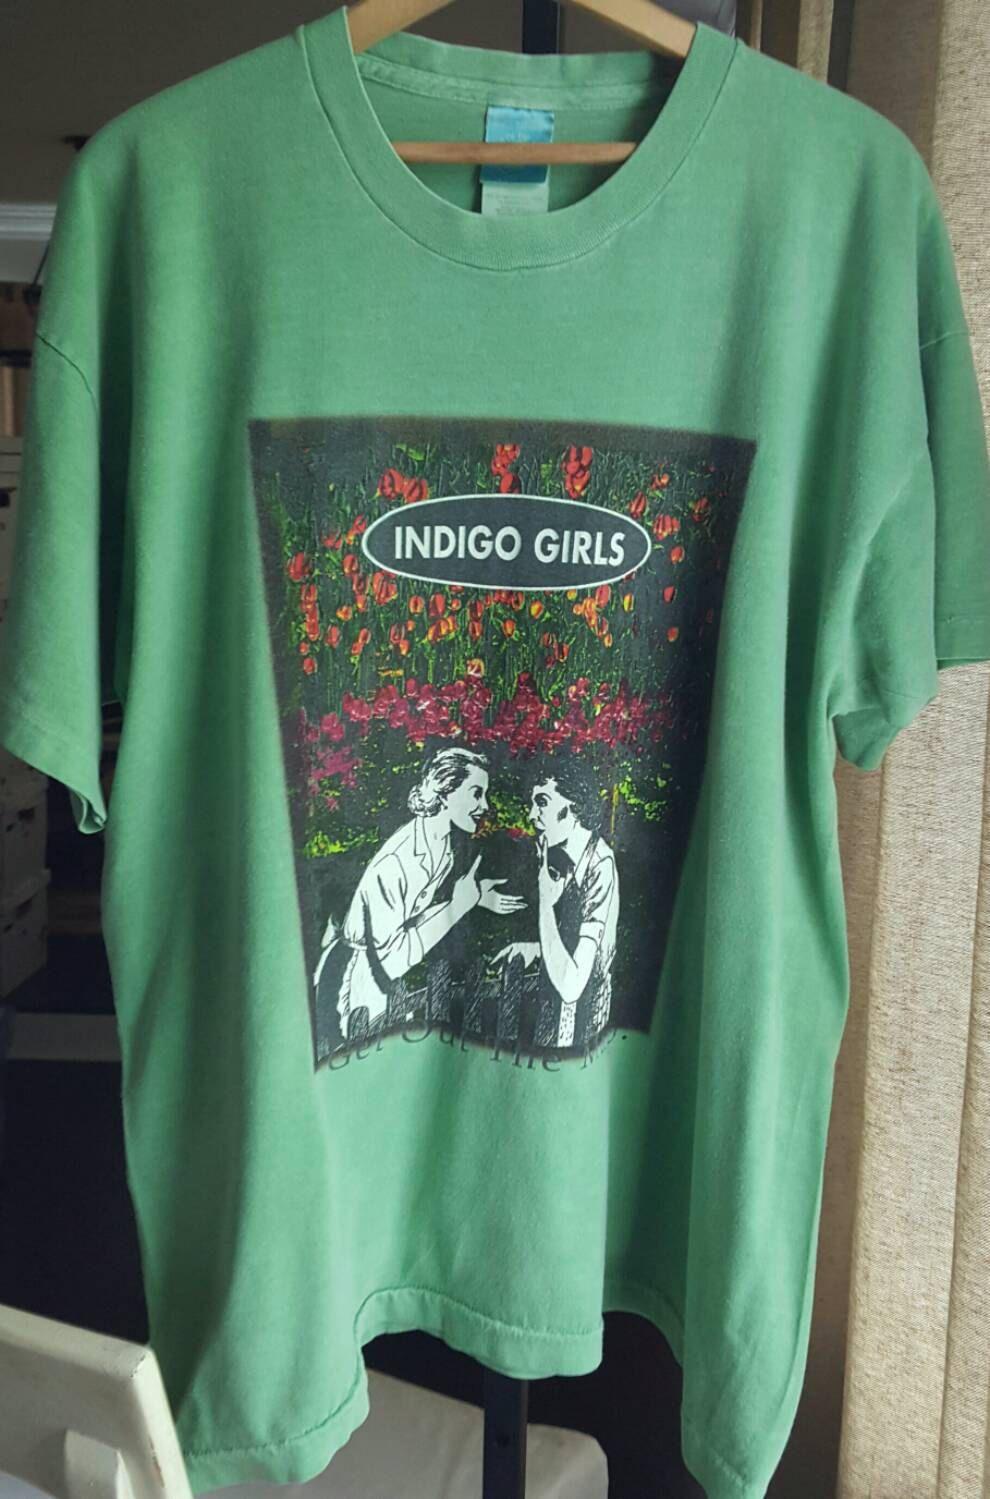 Indigo girls shirt indigo girls band tshirt band shirt